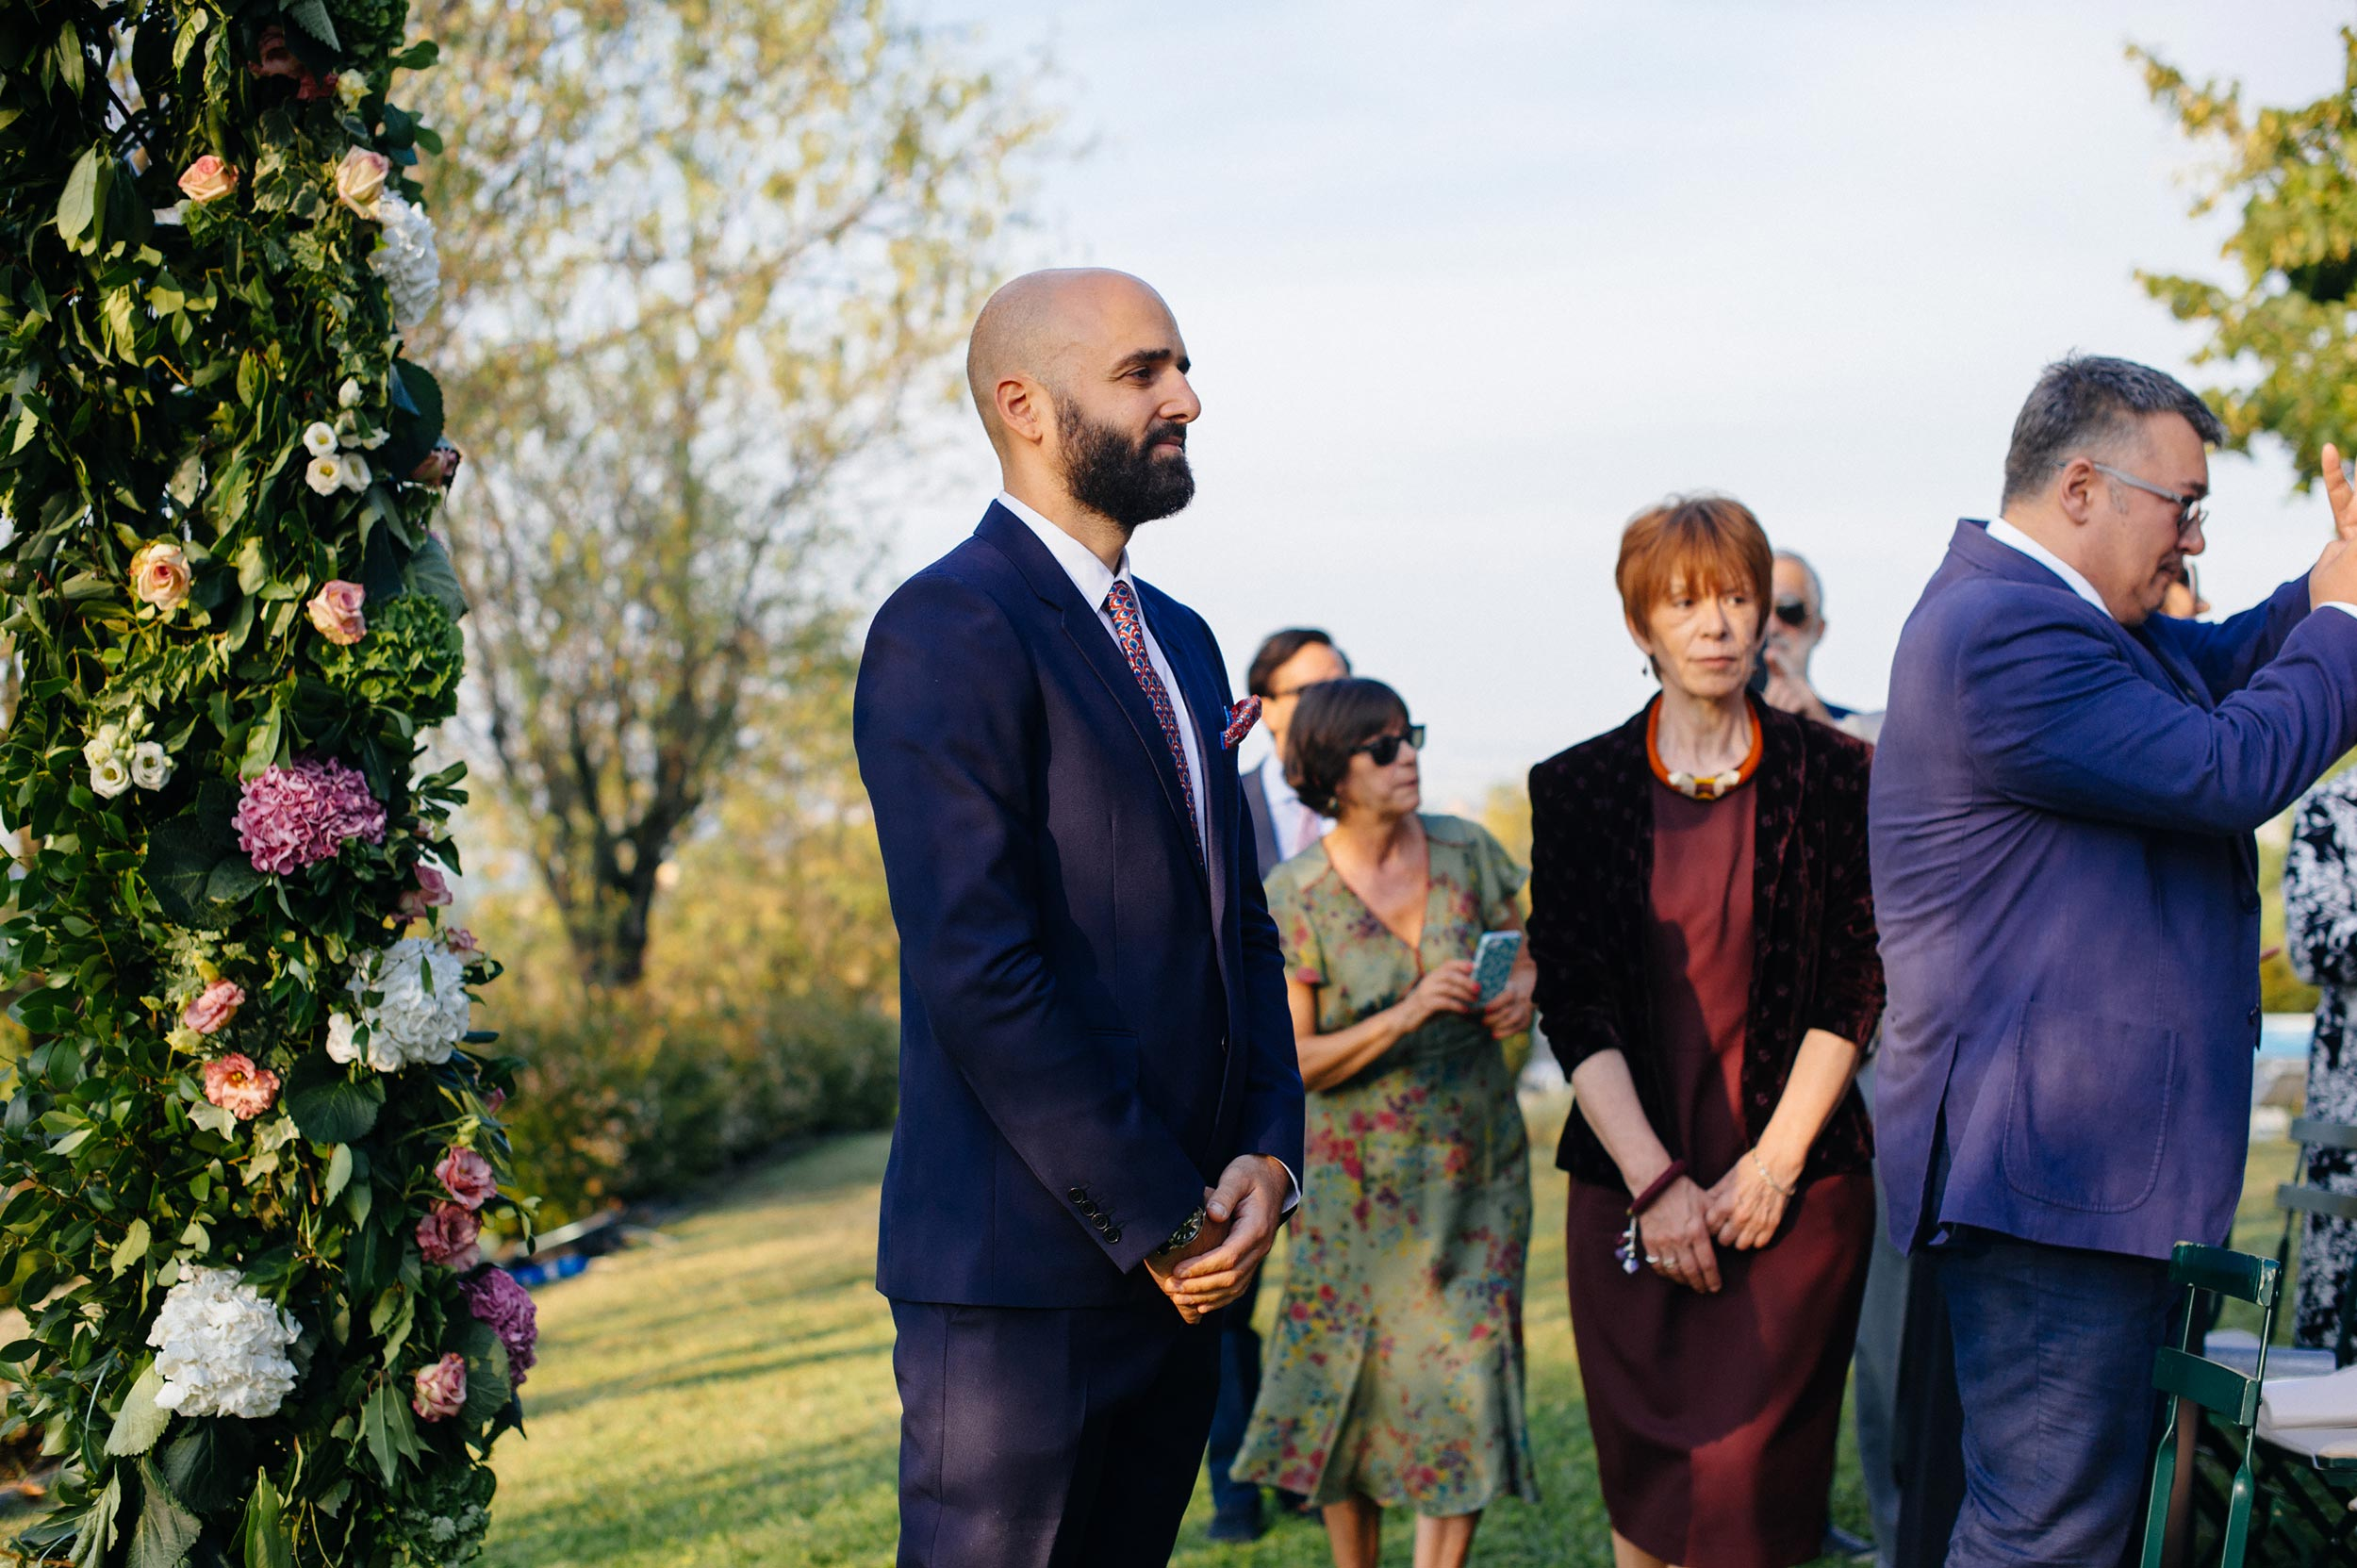 2016-Davor-Chiara-Monferrato-Asti-Vercelli-Wedding-Photographer-Italy-Alessandro-Avenali-28.jpg